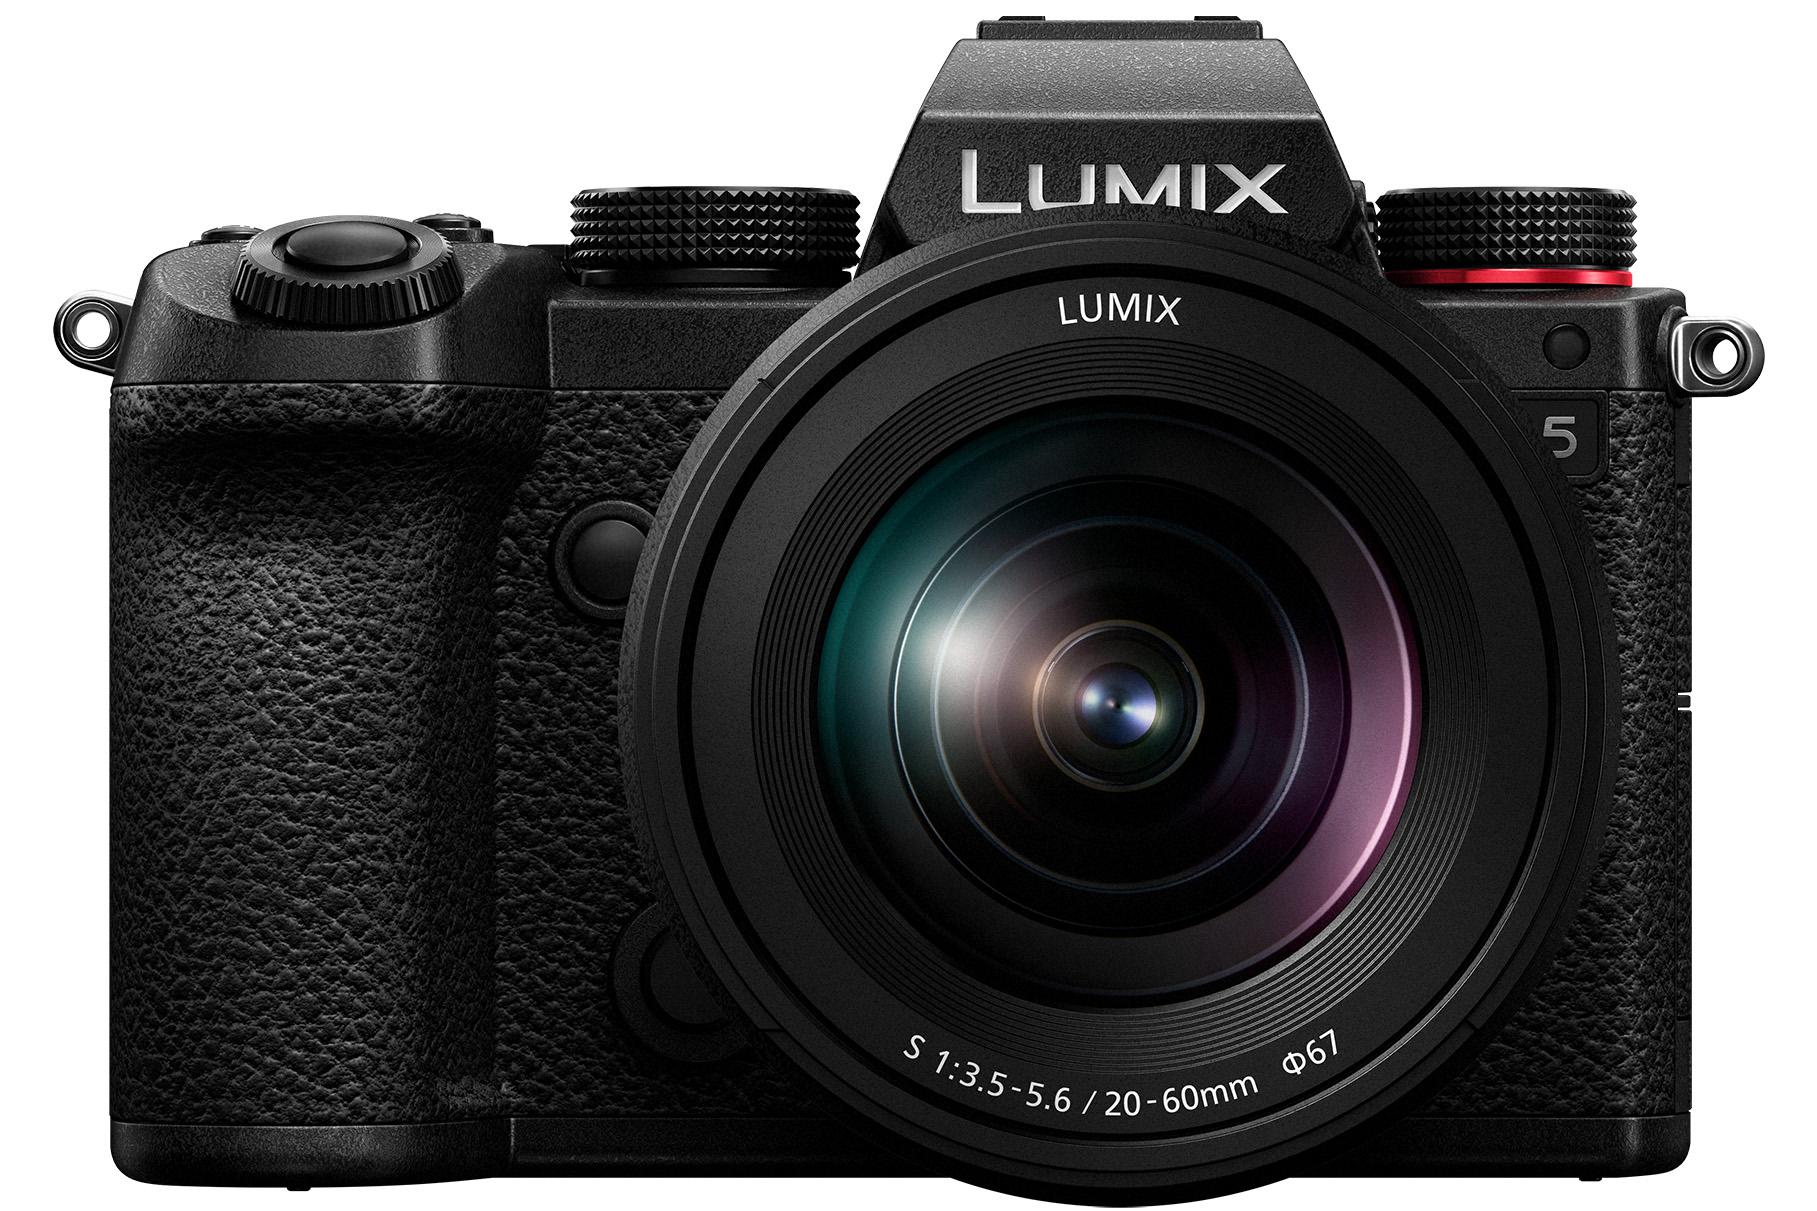 【Panasonic】コンパクトなS1、新製品 LUMIX DC-S5